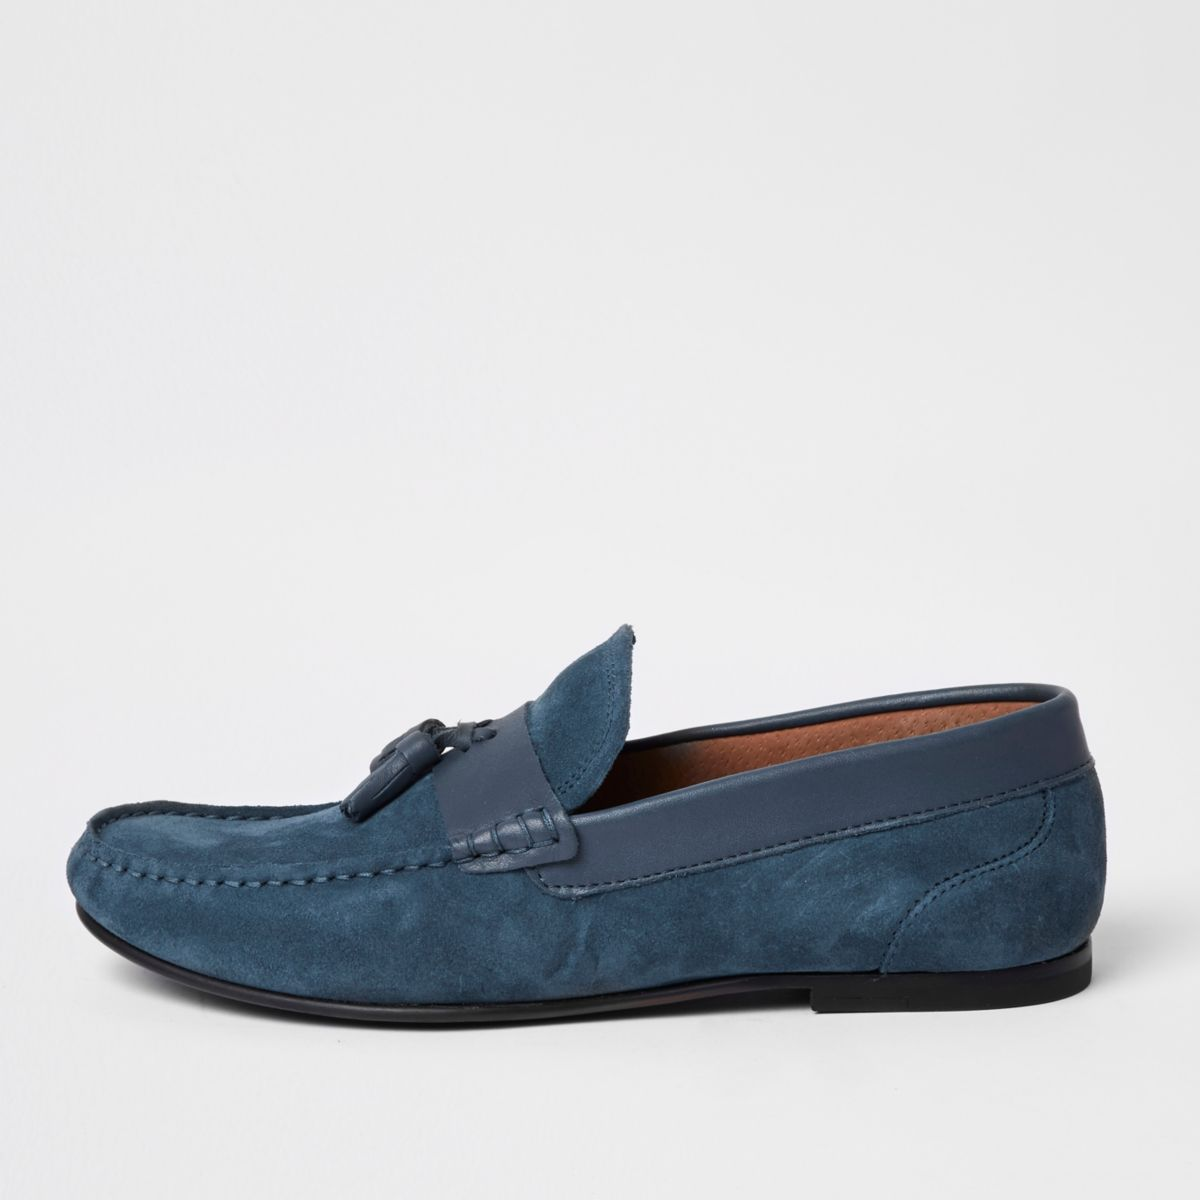 Blue suede tassel loafers